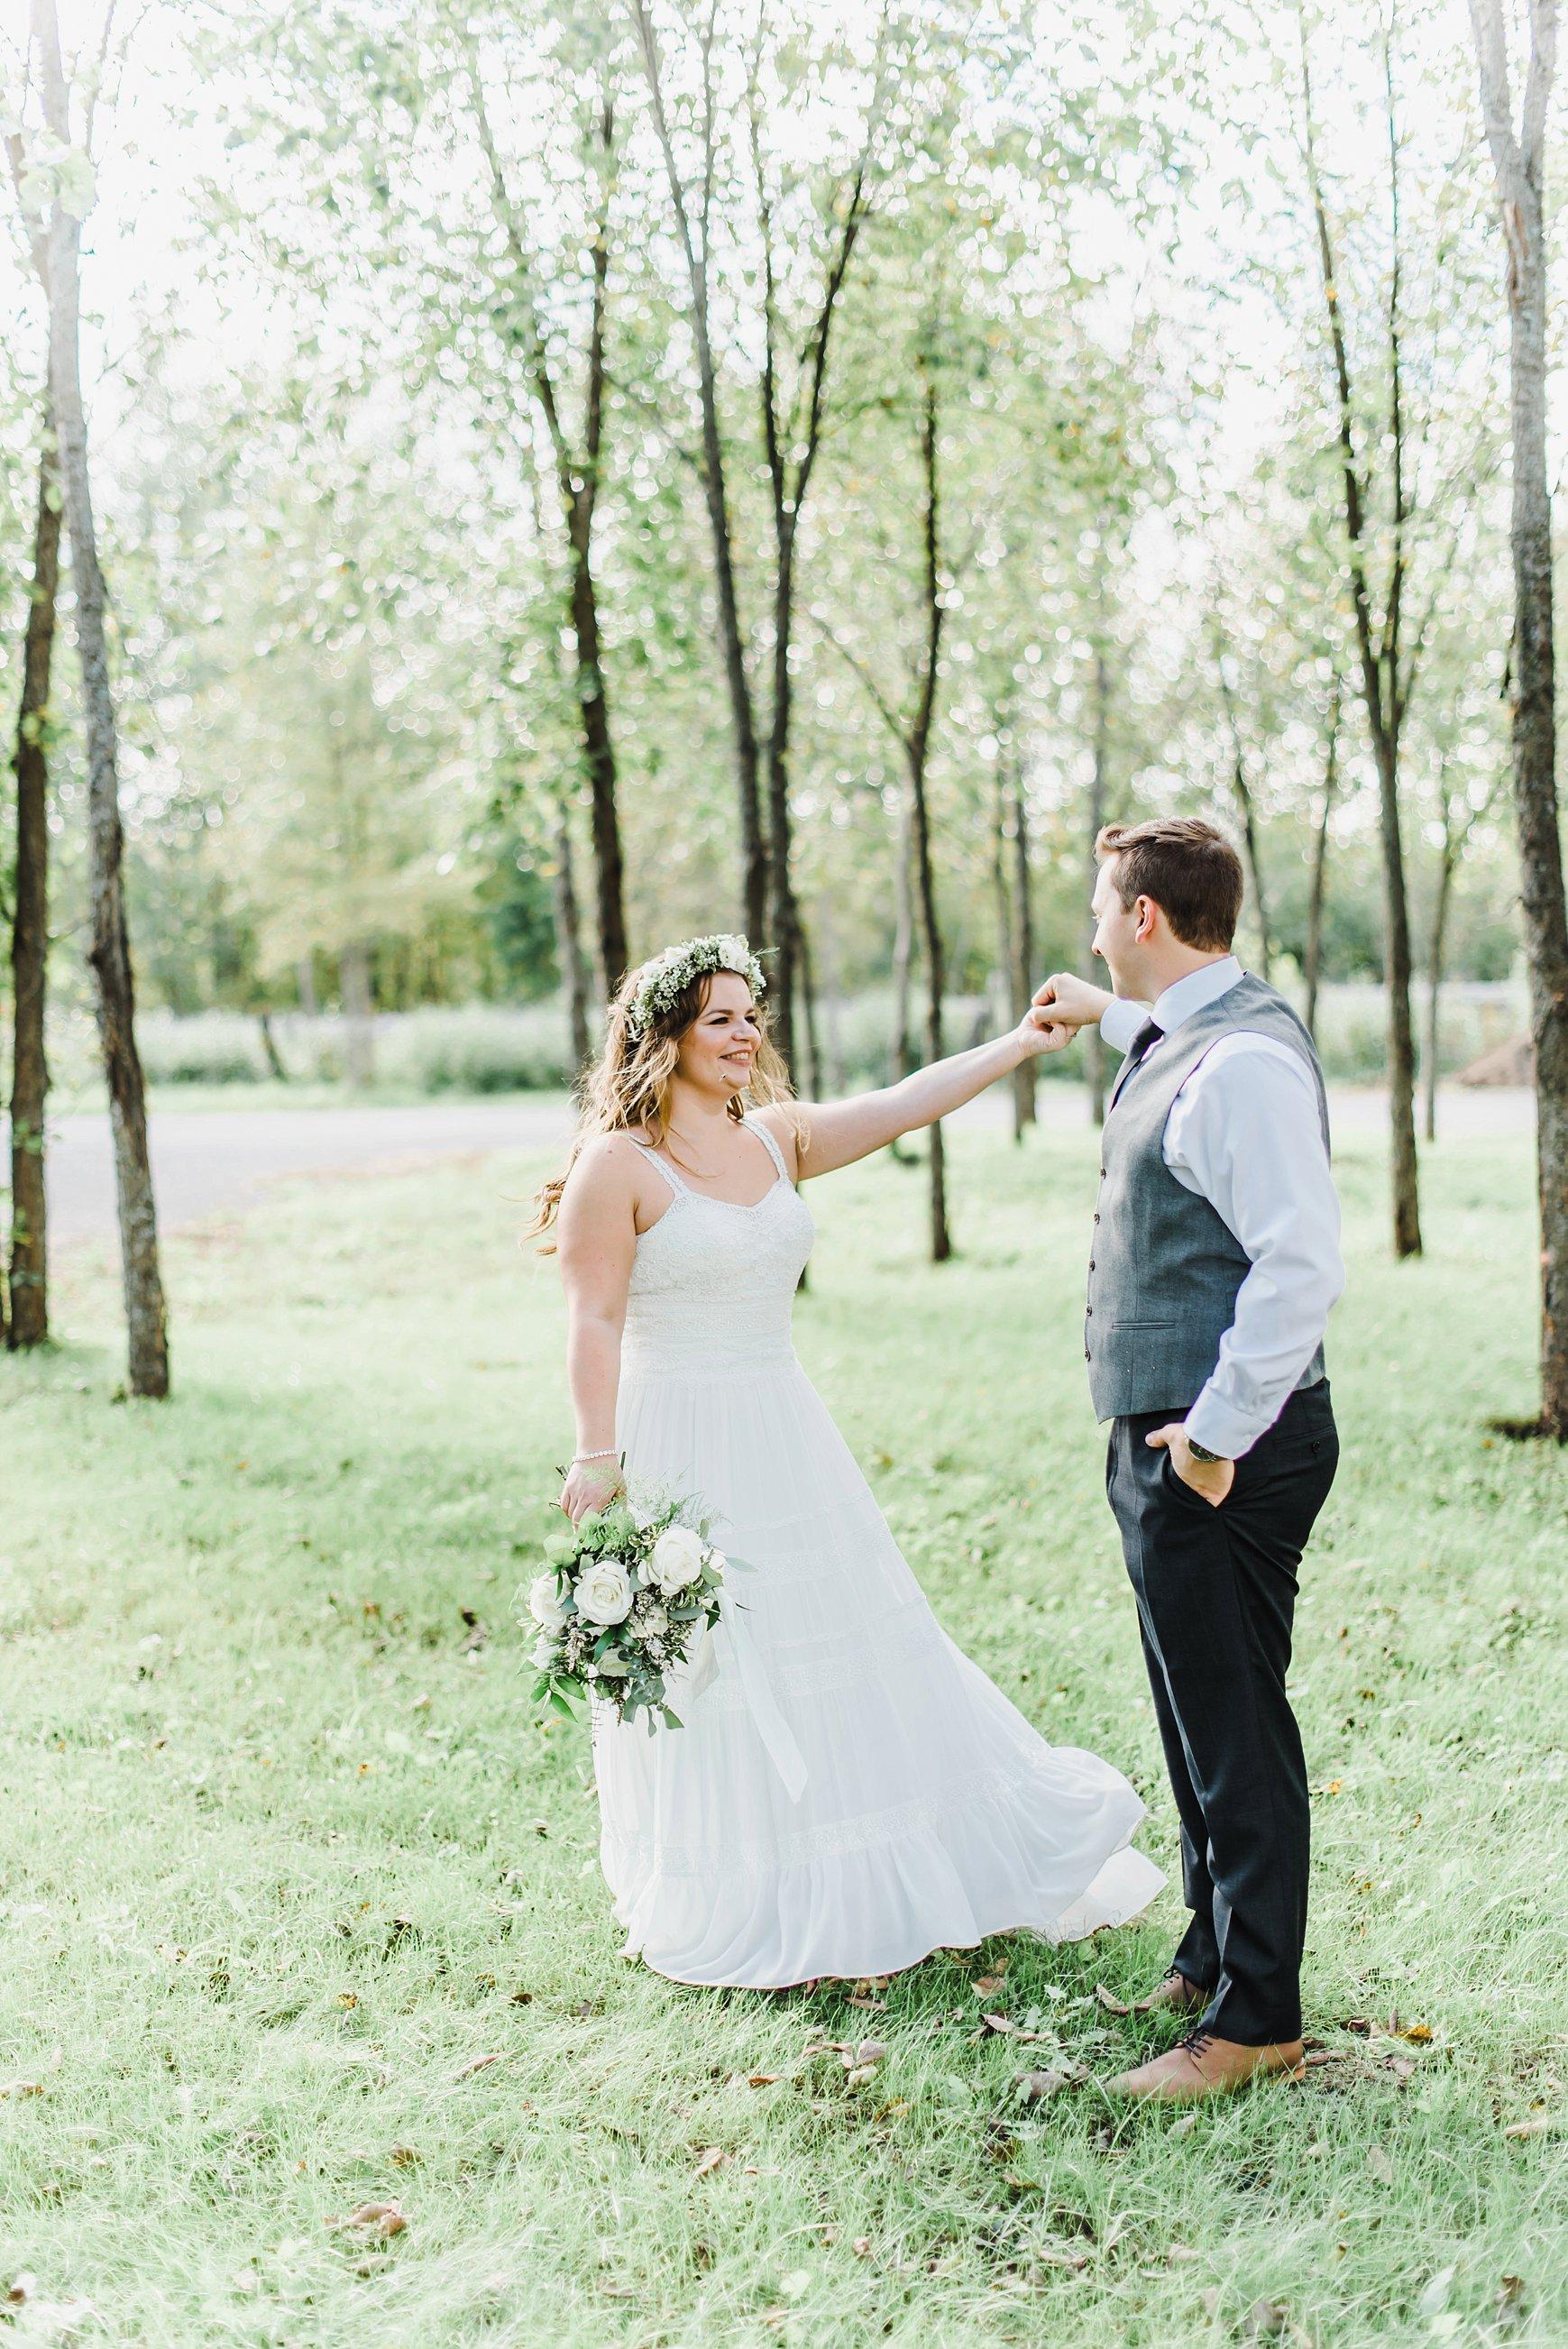 light airy indie fine art ottawa wedding photographer | Ali and Batoul Photography_1113.jpg